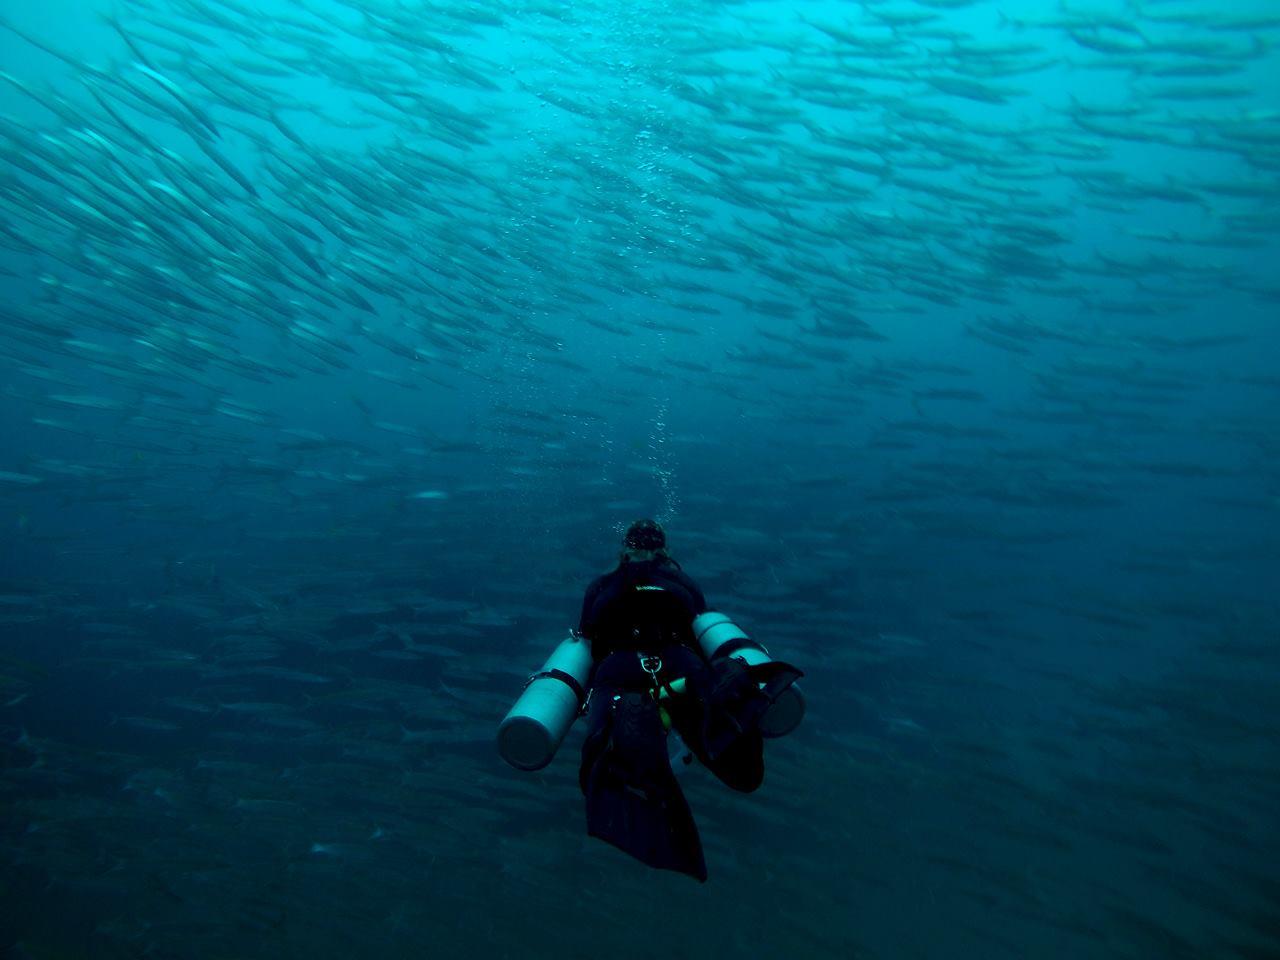 Yann-Sidemount-barracuda